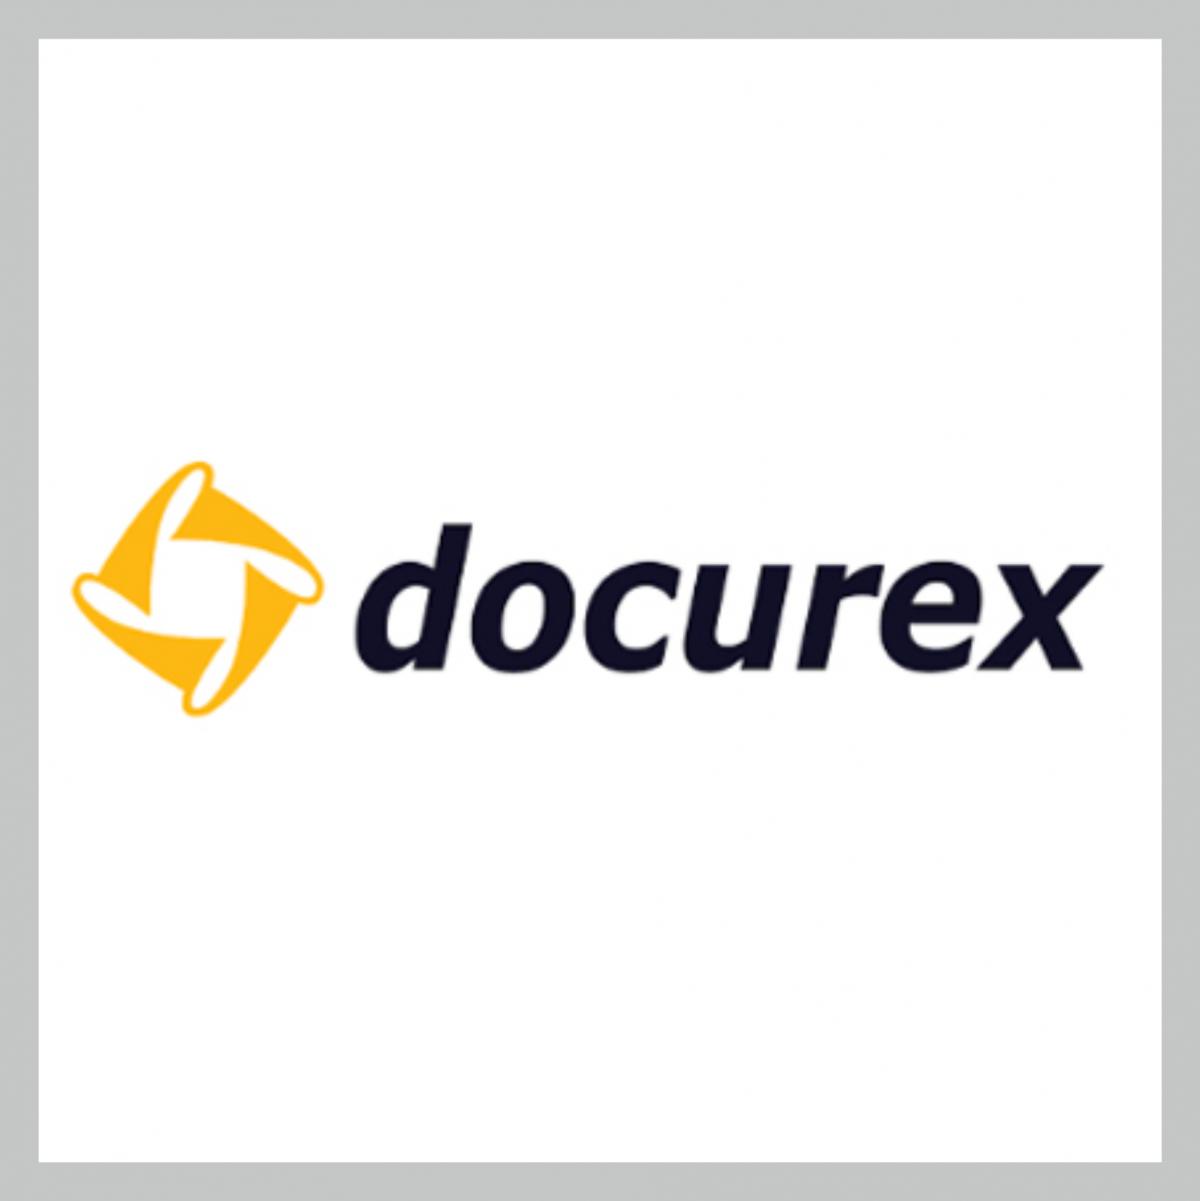 Docurex, hochsicherer virtueller Datenraum